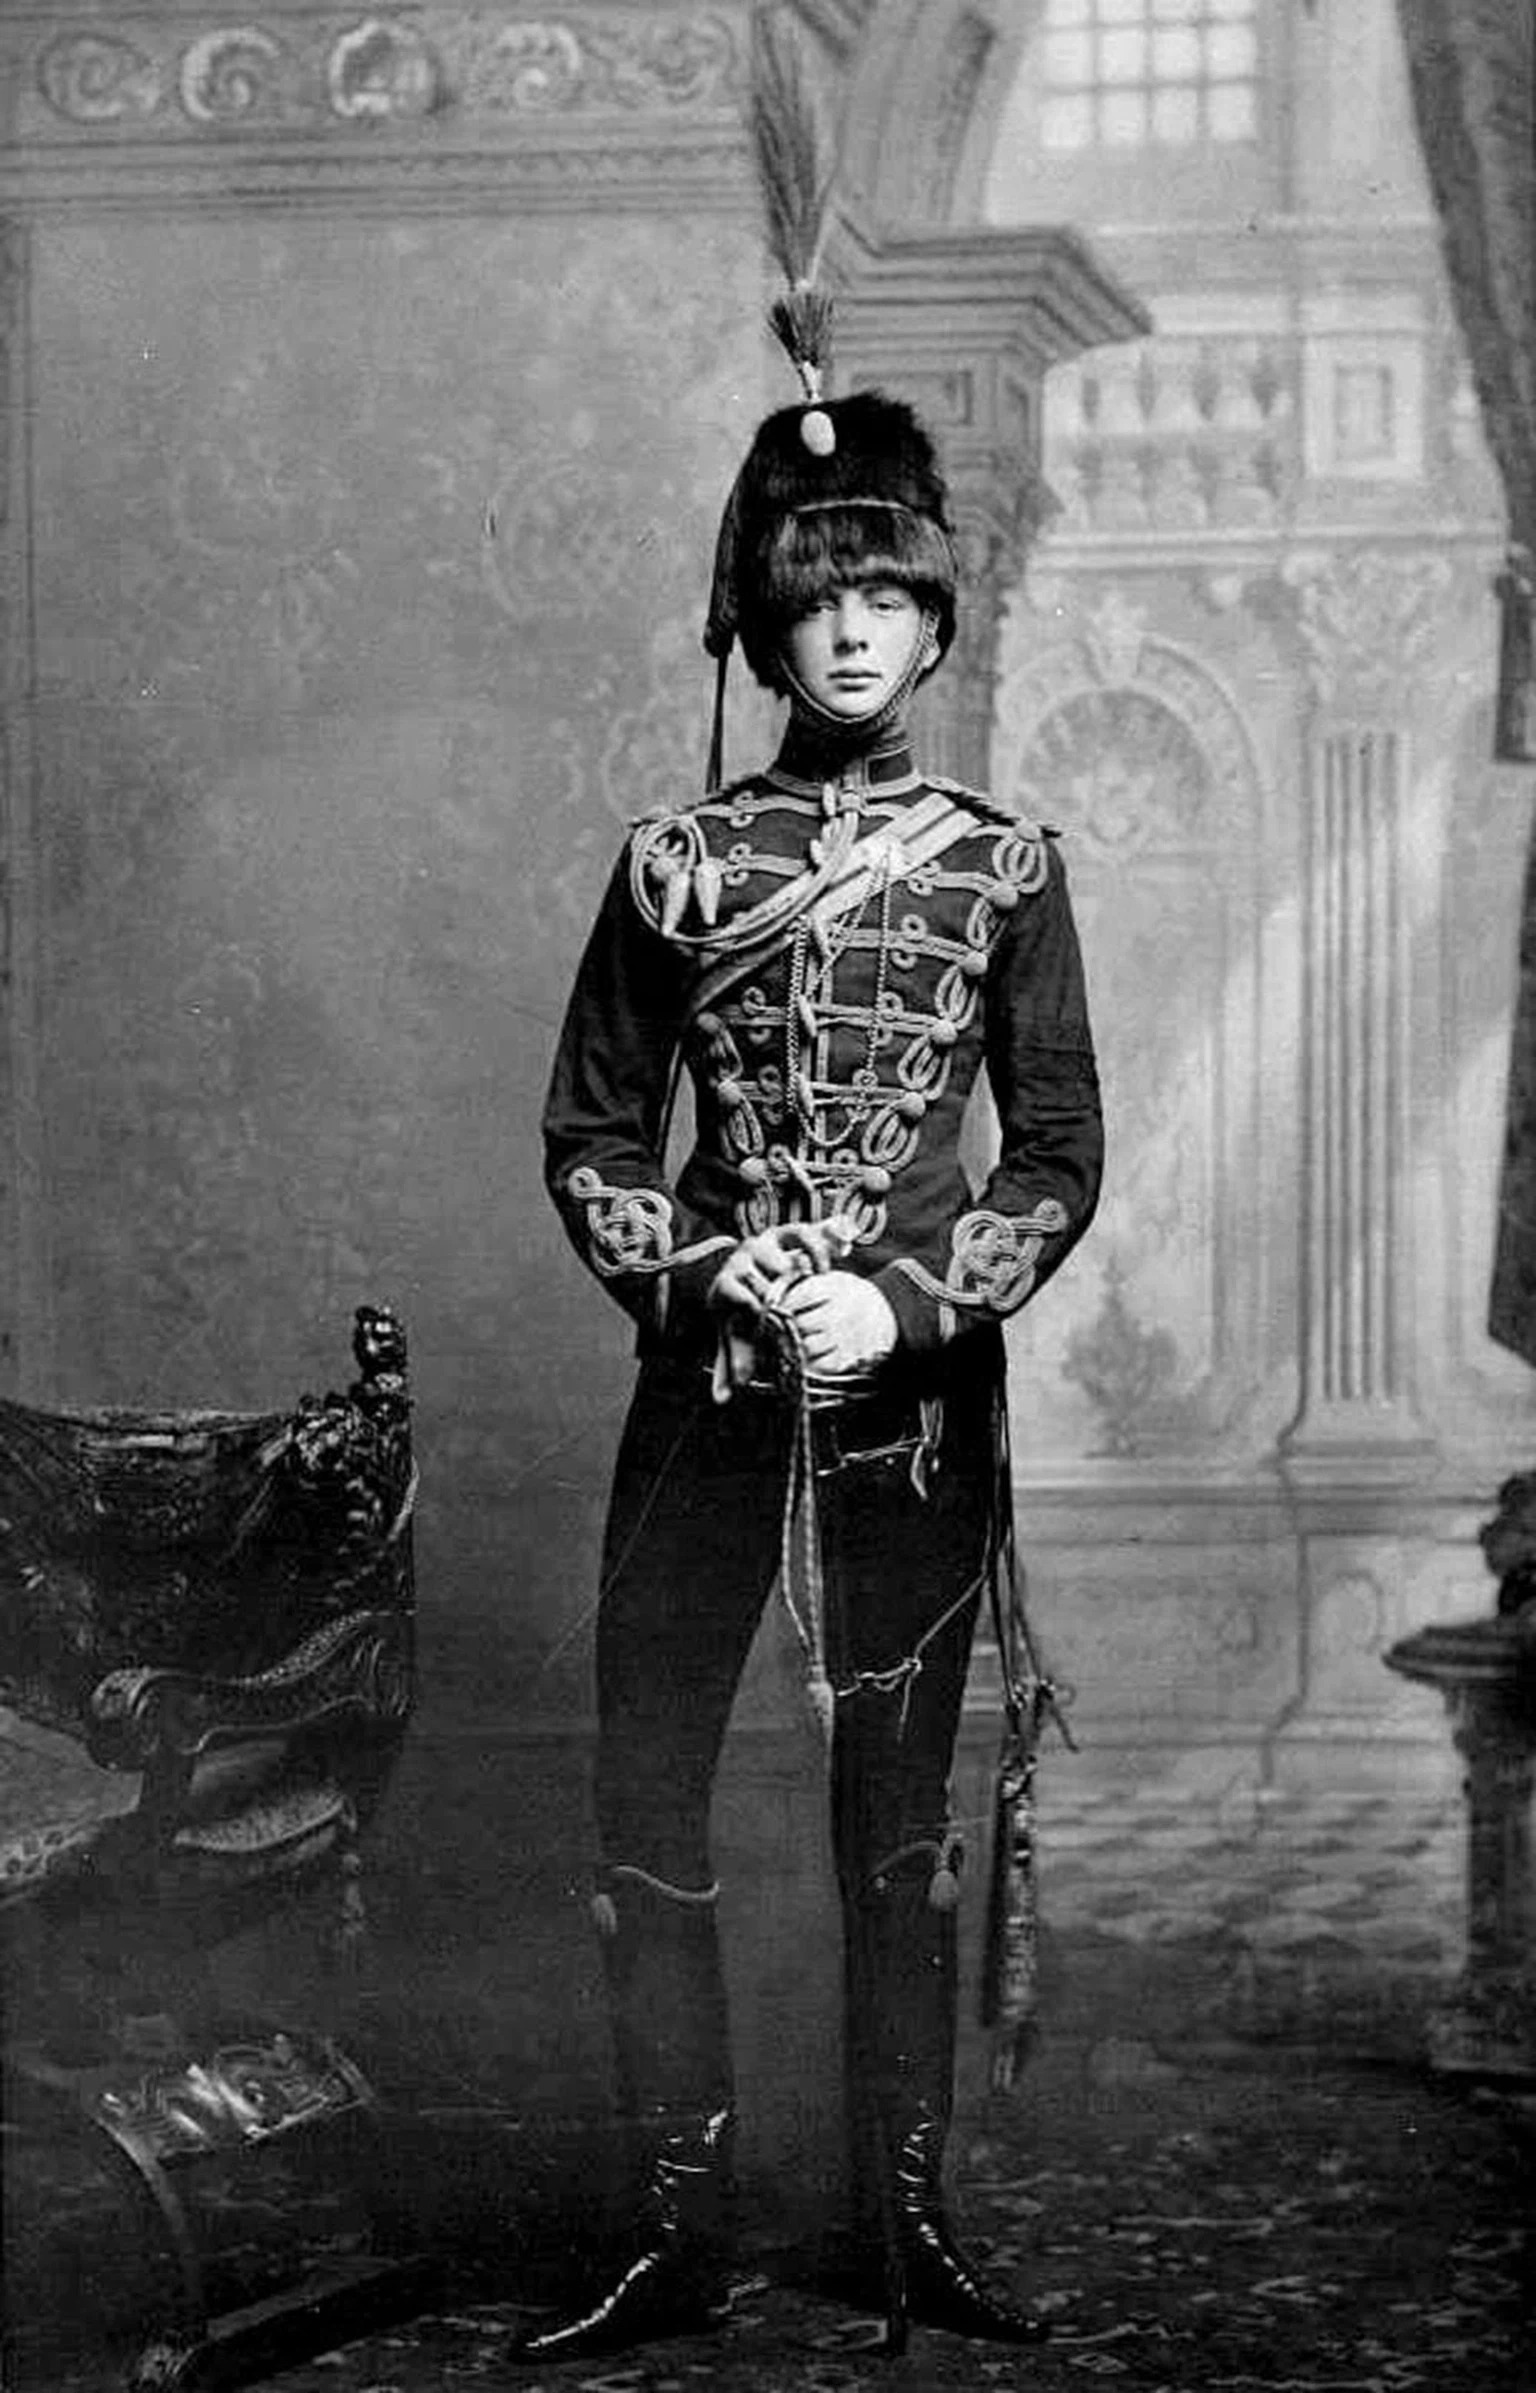 Winston Churchill wearing hessian boots